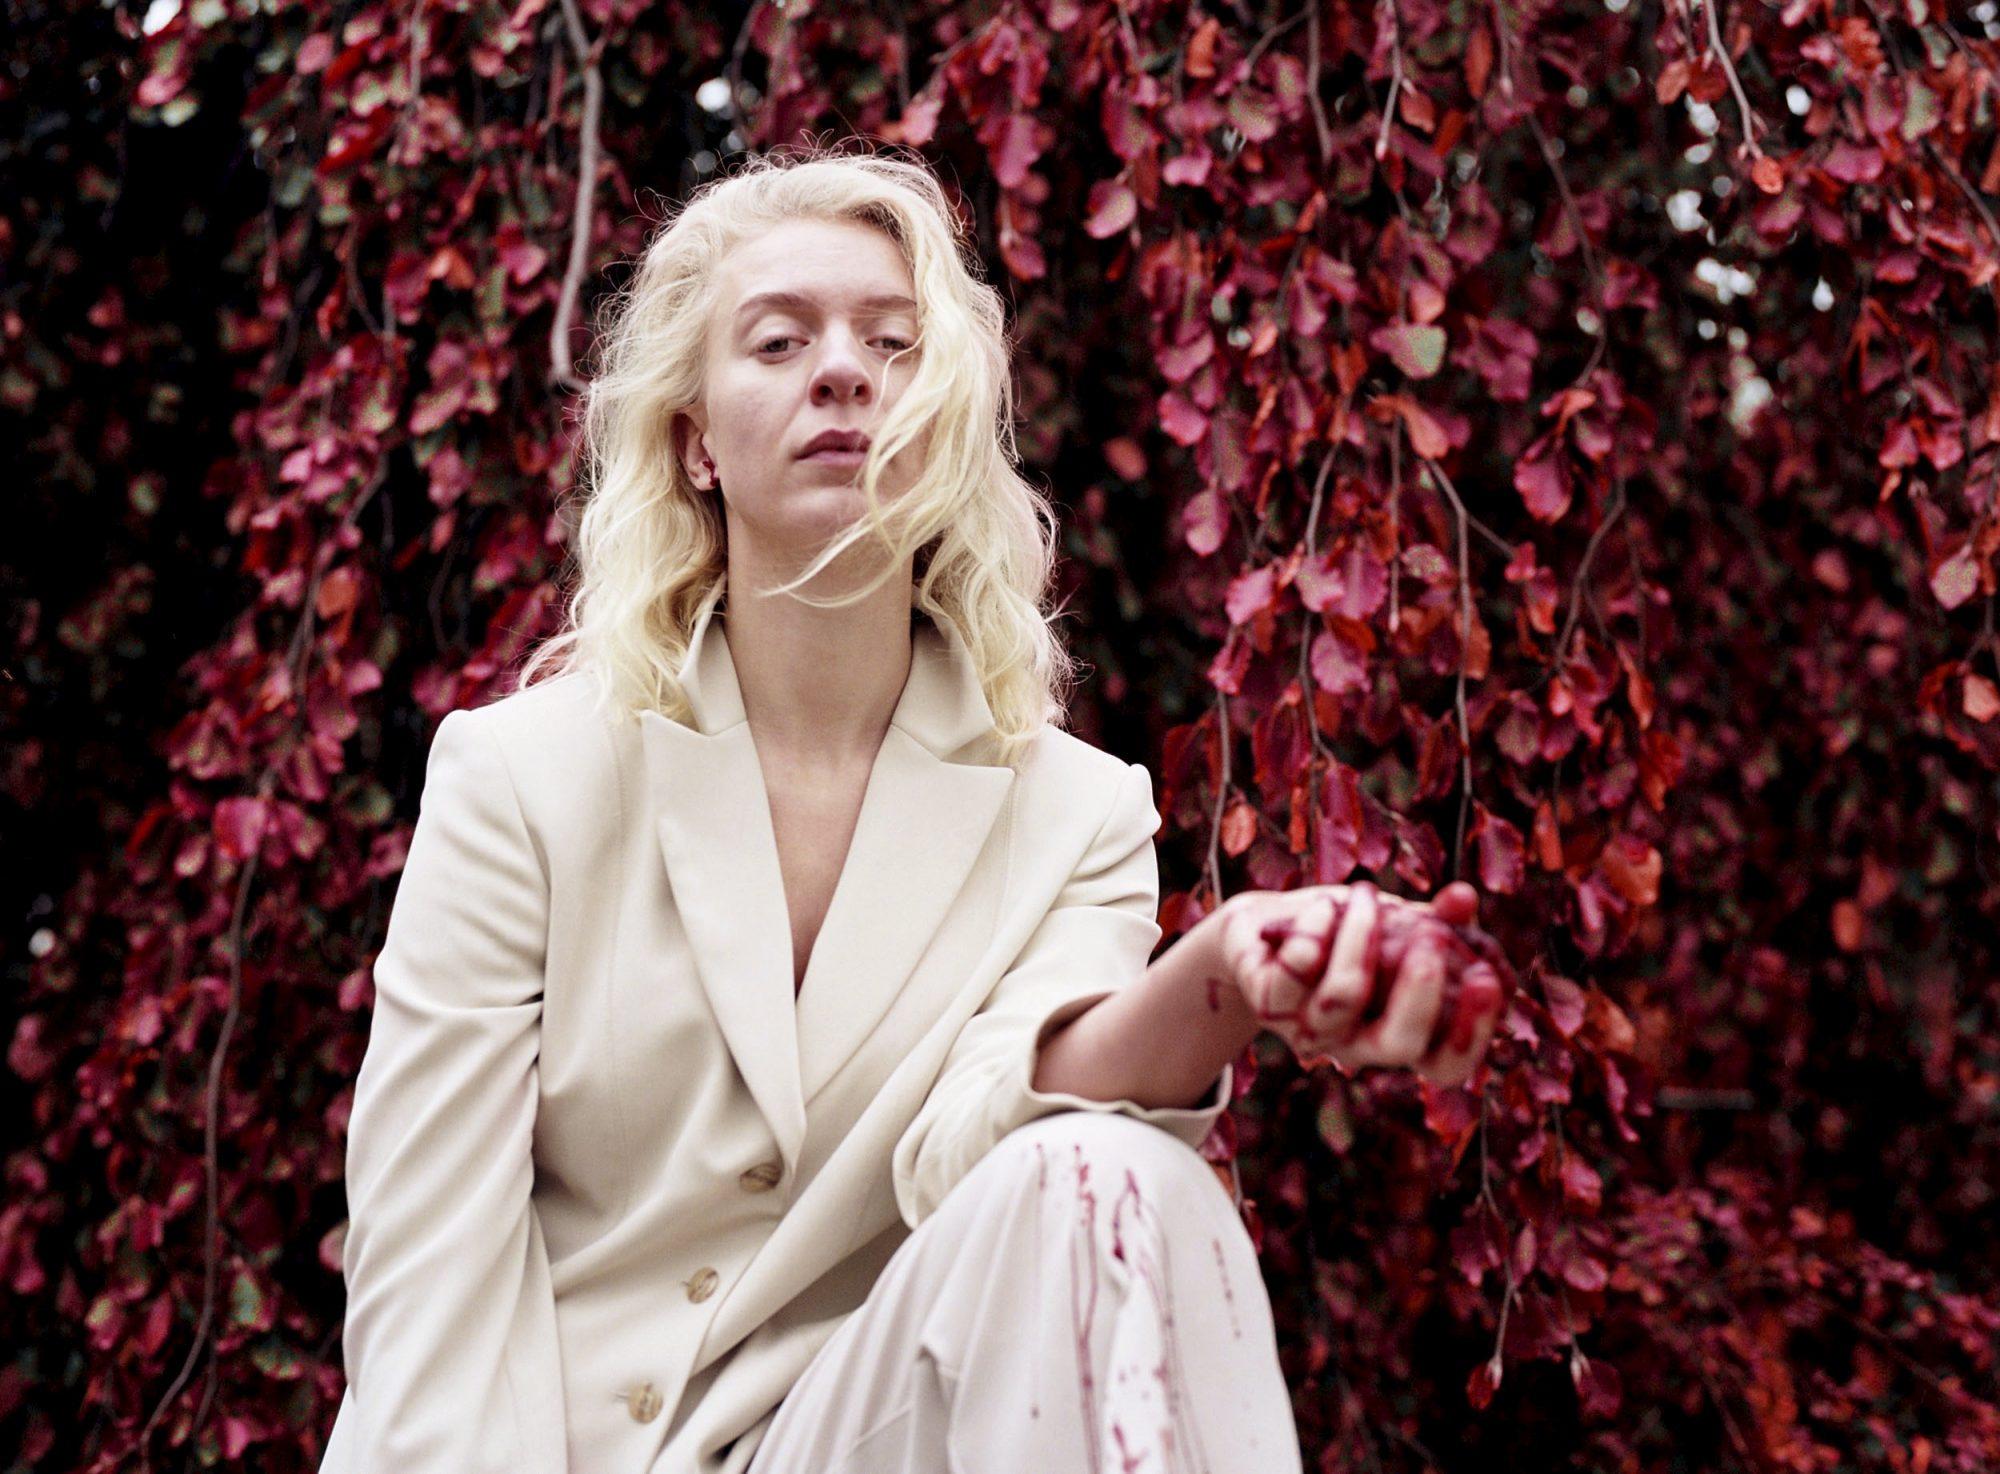 Dagsavisen kallar Thea Hjelmeland si tredje plate ein «dramatisk poptriumf». Foto: Foto: Linn Stokkedal / Handout